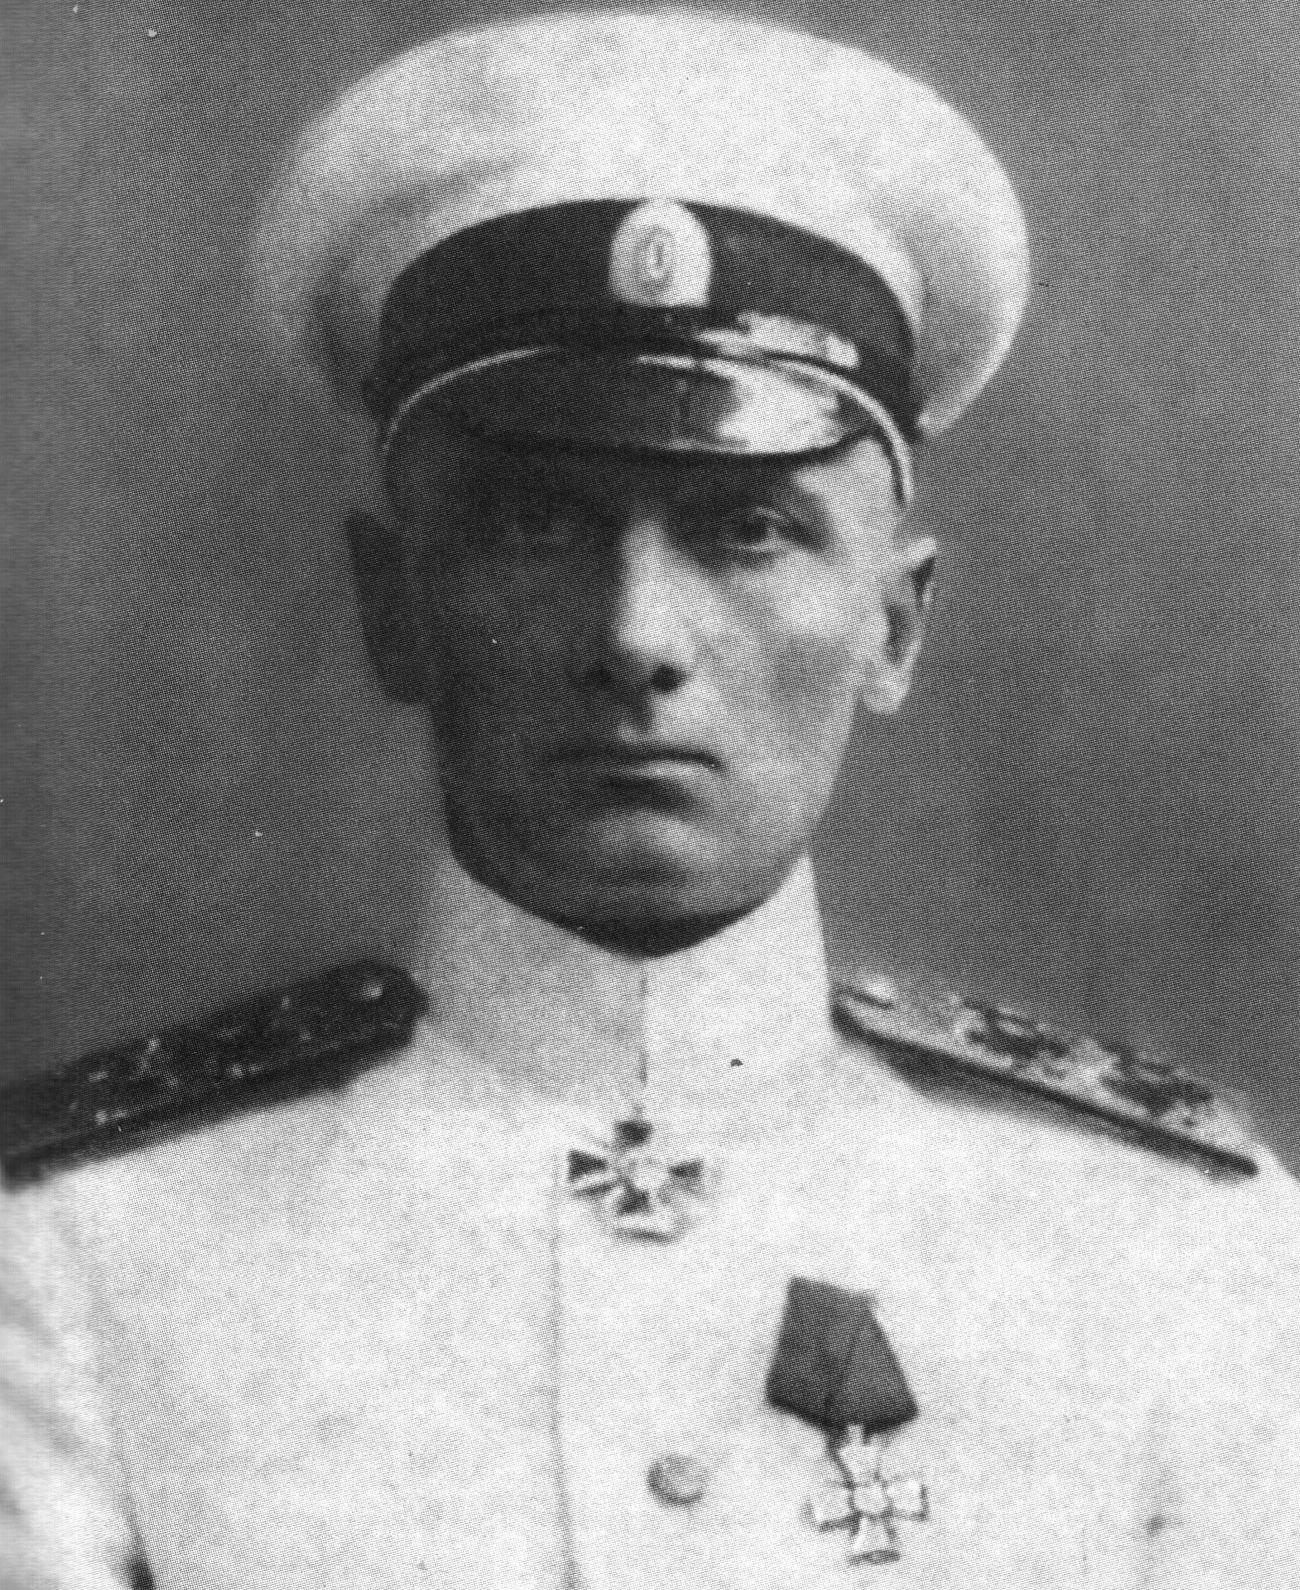 Alexander Koltchak